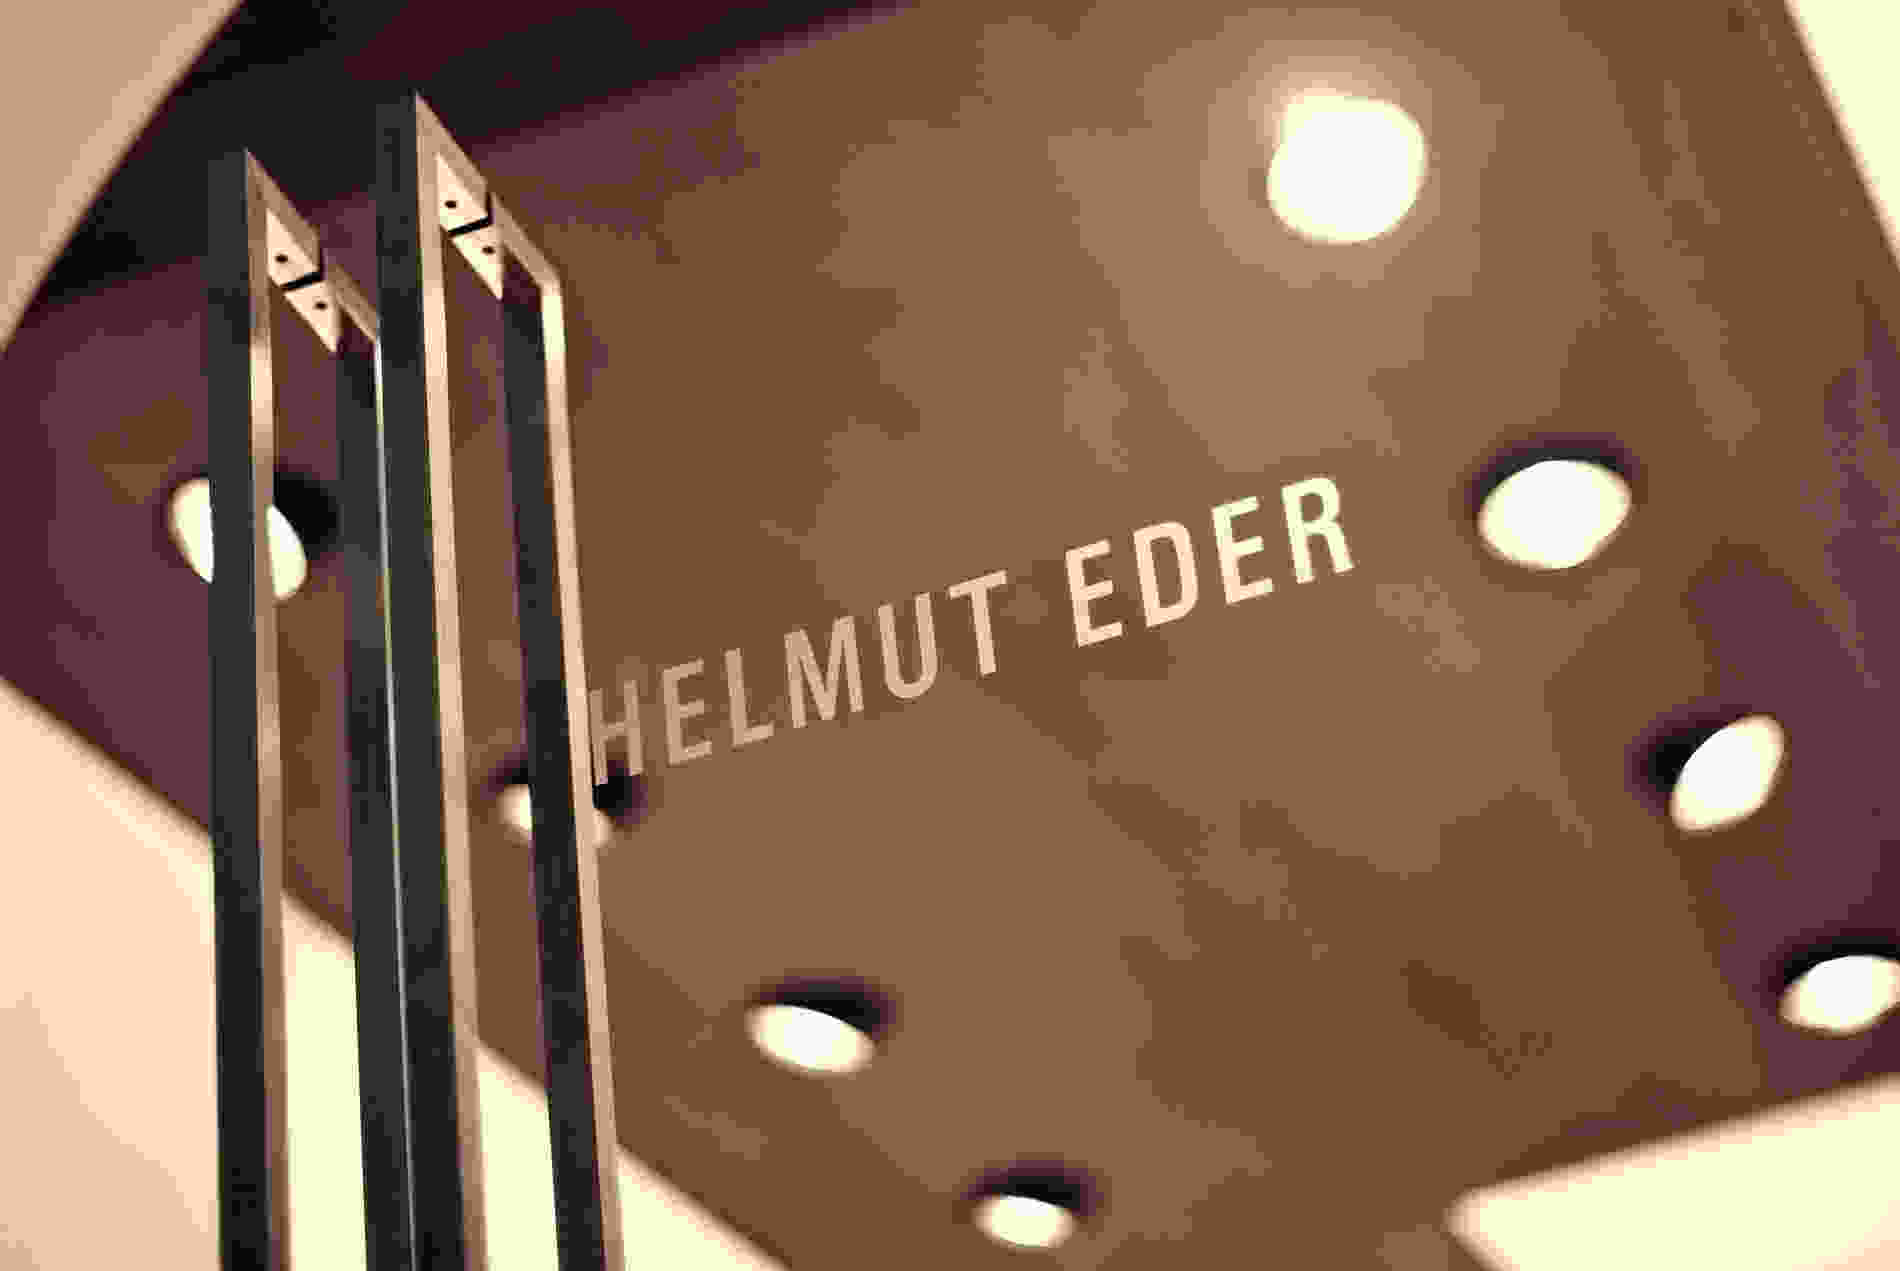 196 Womans Fashion Shop Helmut Eder 001 logo